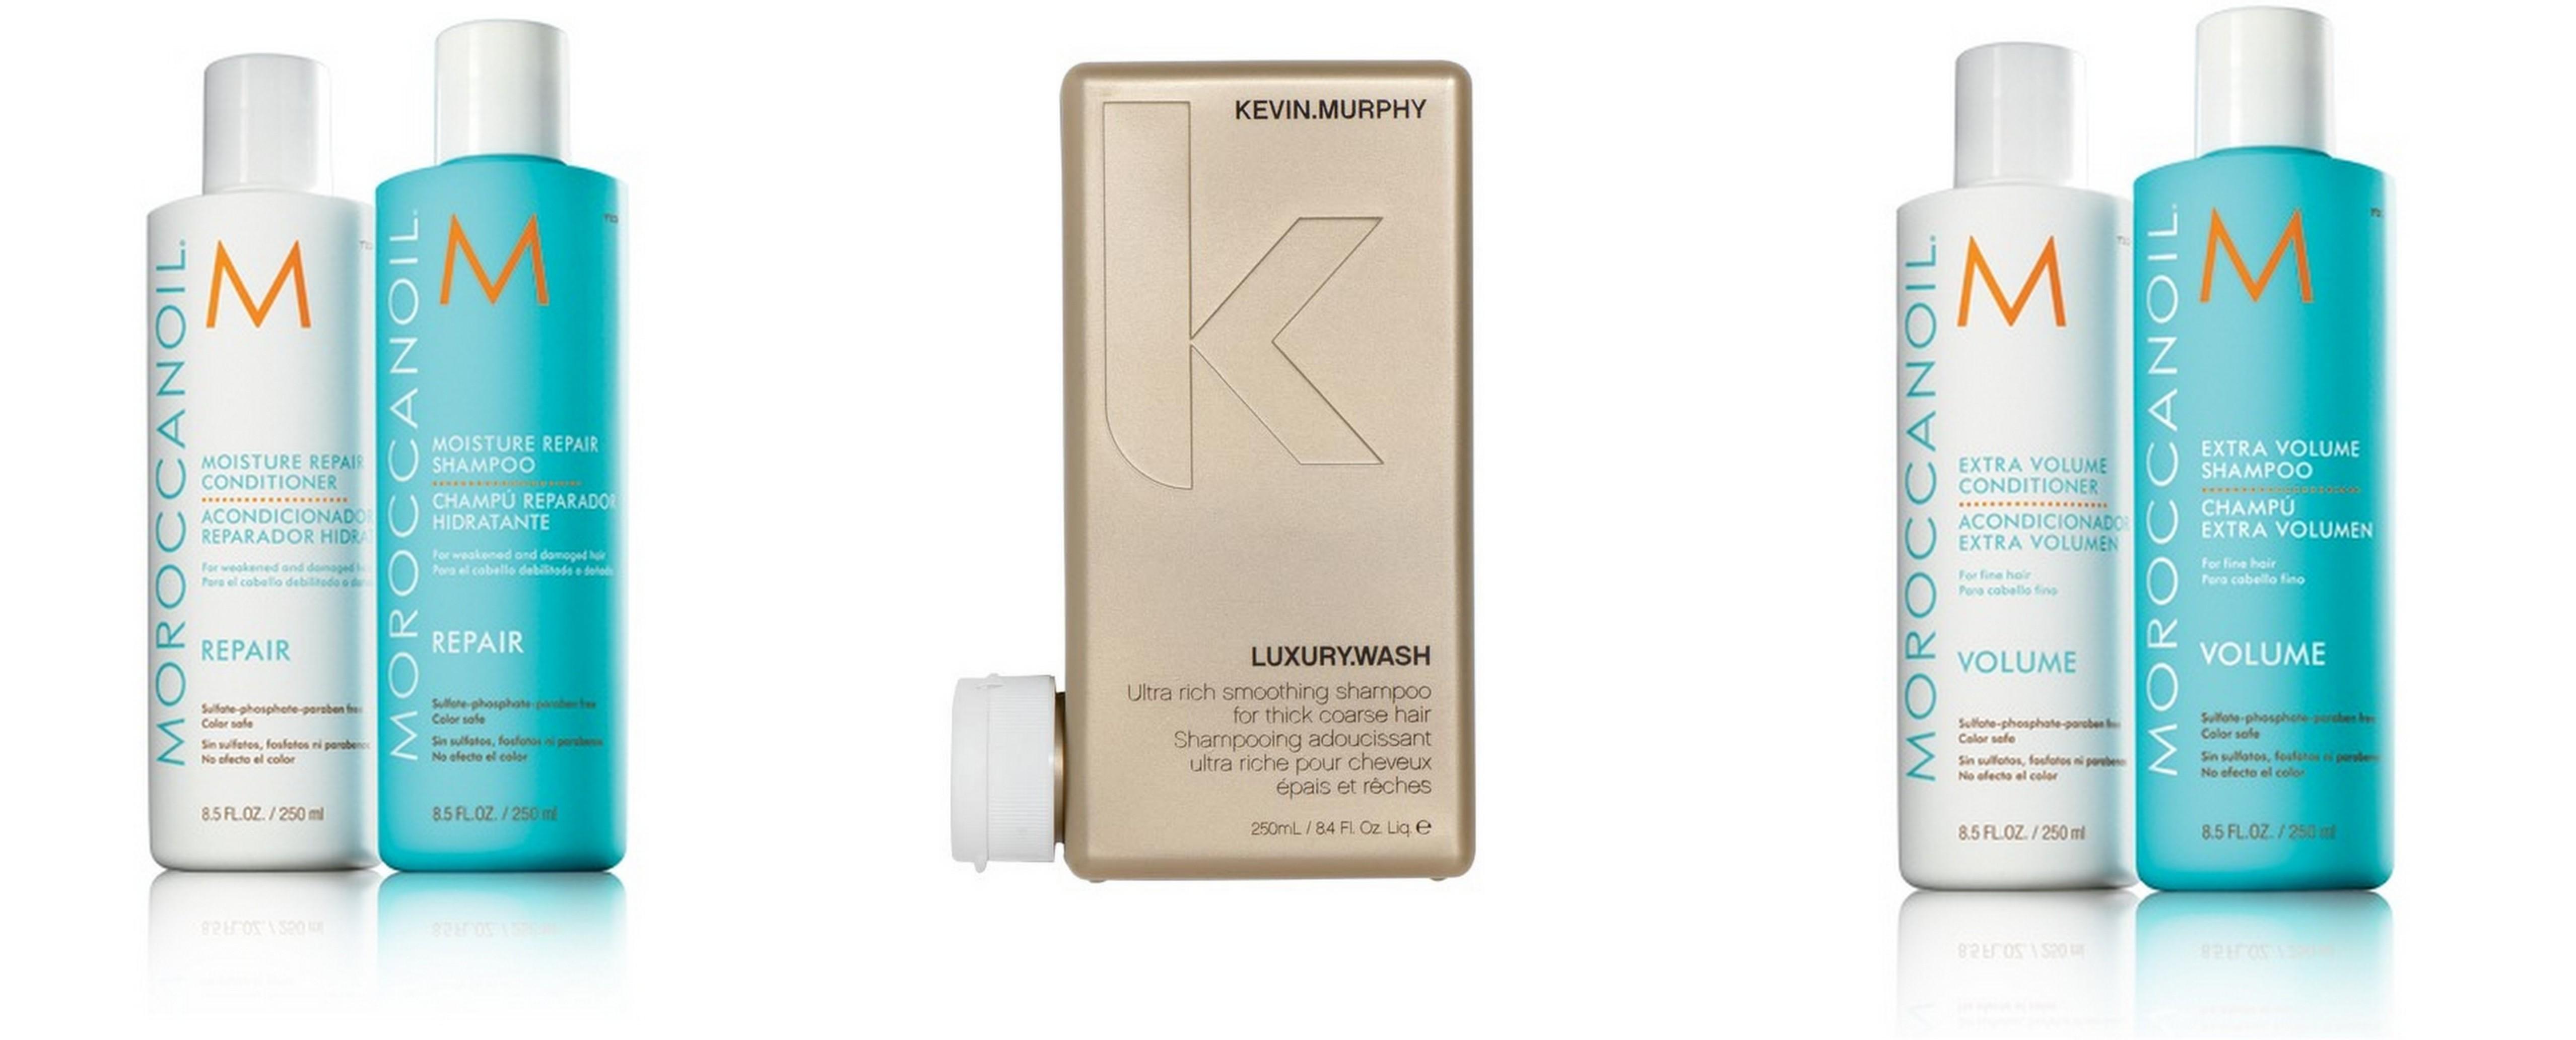 Sulfatfri shampoo udvalg